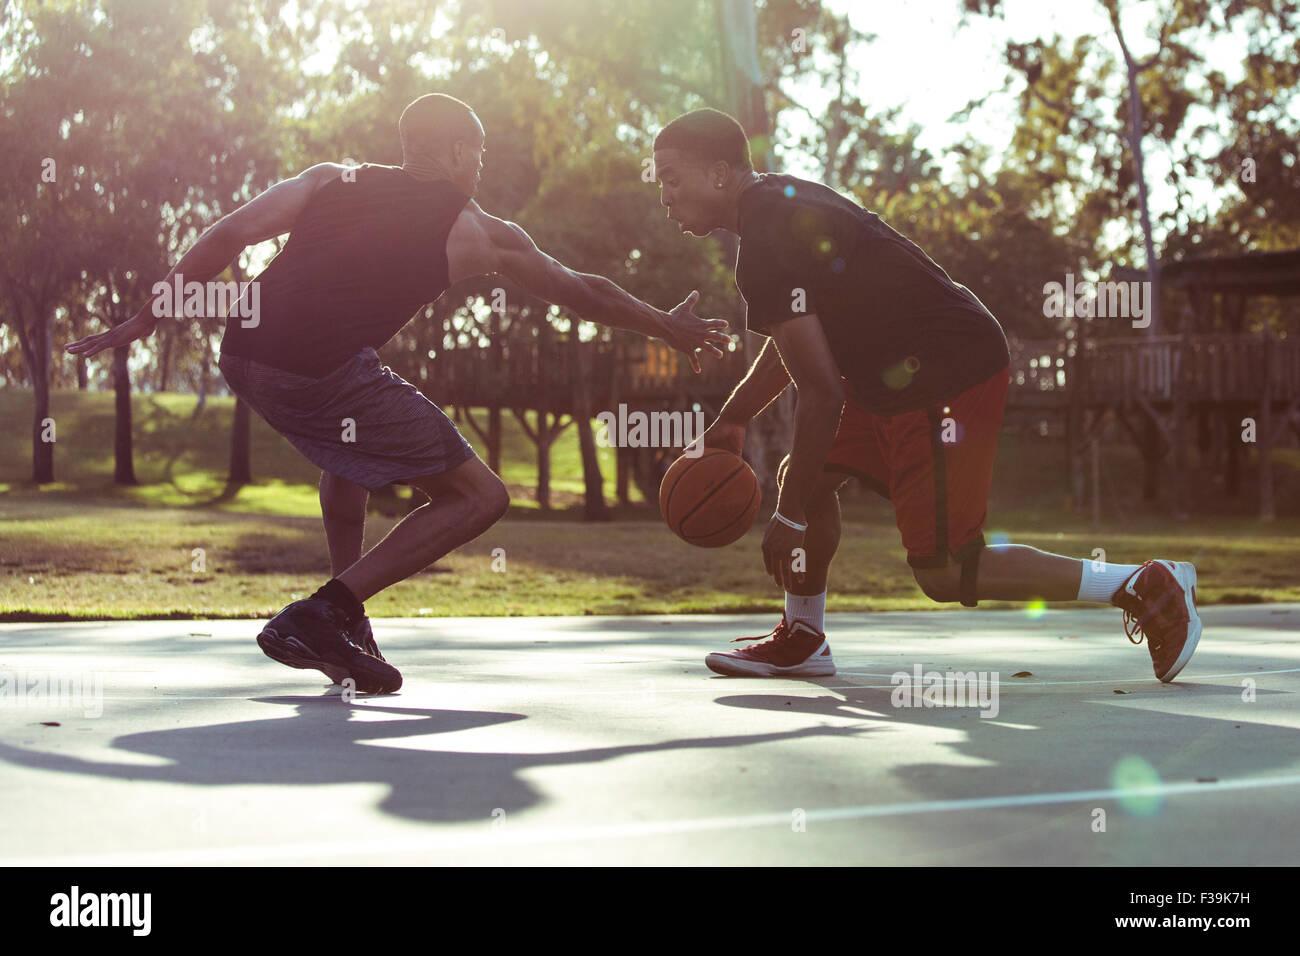 Zwei junge Männer spielen Basketball im Park bei Sonnenuntergang Stockfoto